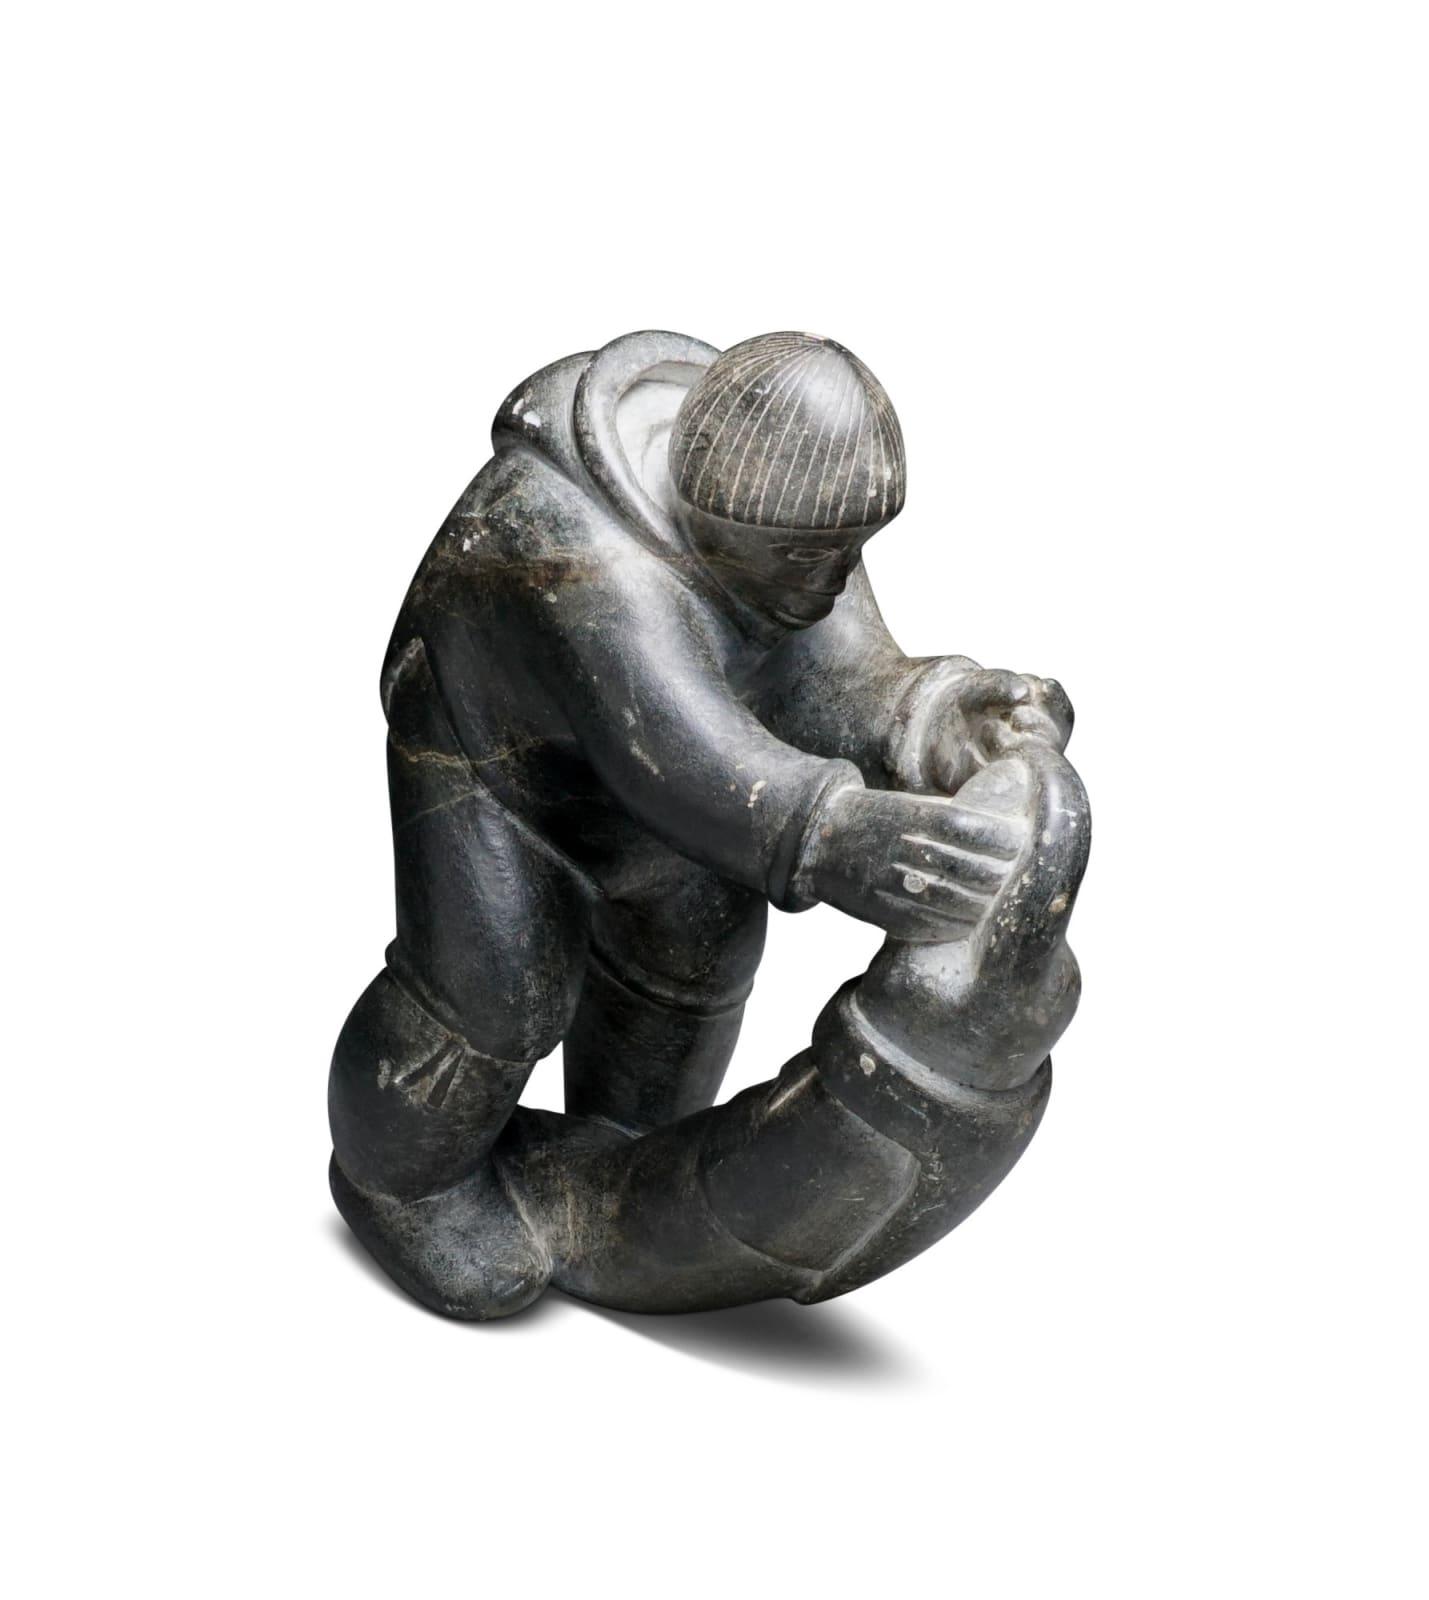 LOT 46 LEVI QUMALUK (1919-1997) PUVIRNITUQ (POVUNGNITUK) Hunter with Seal, early-mid 1960s stone, 8 1/4 x 6 1/2 x 3 1/2 in (21 x 16.5 x 8.9 cm) ESTIMATE: $800 — $1,200